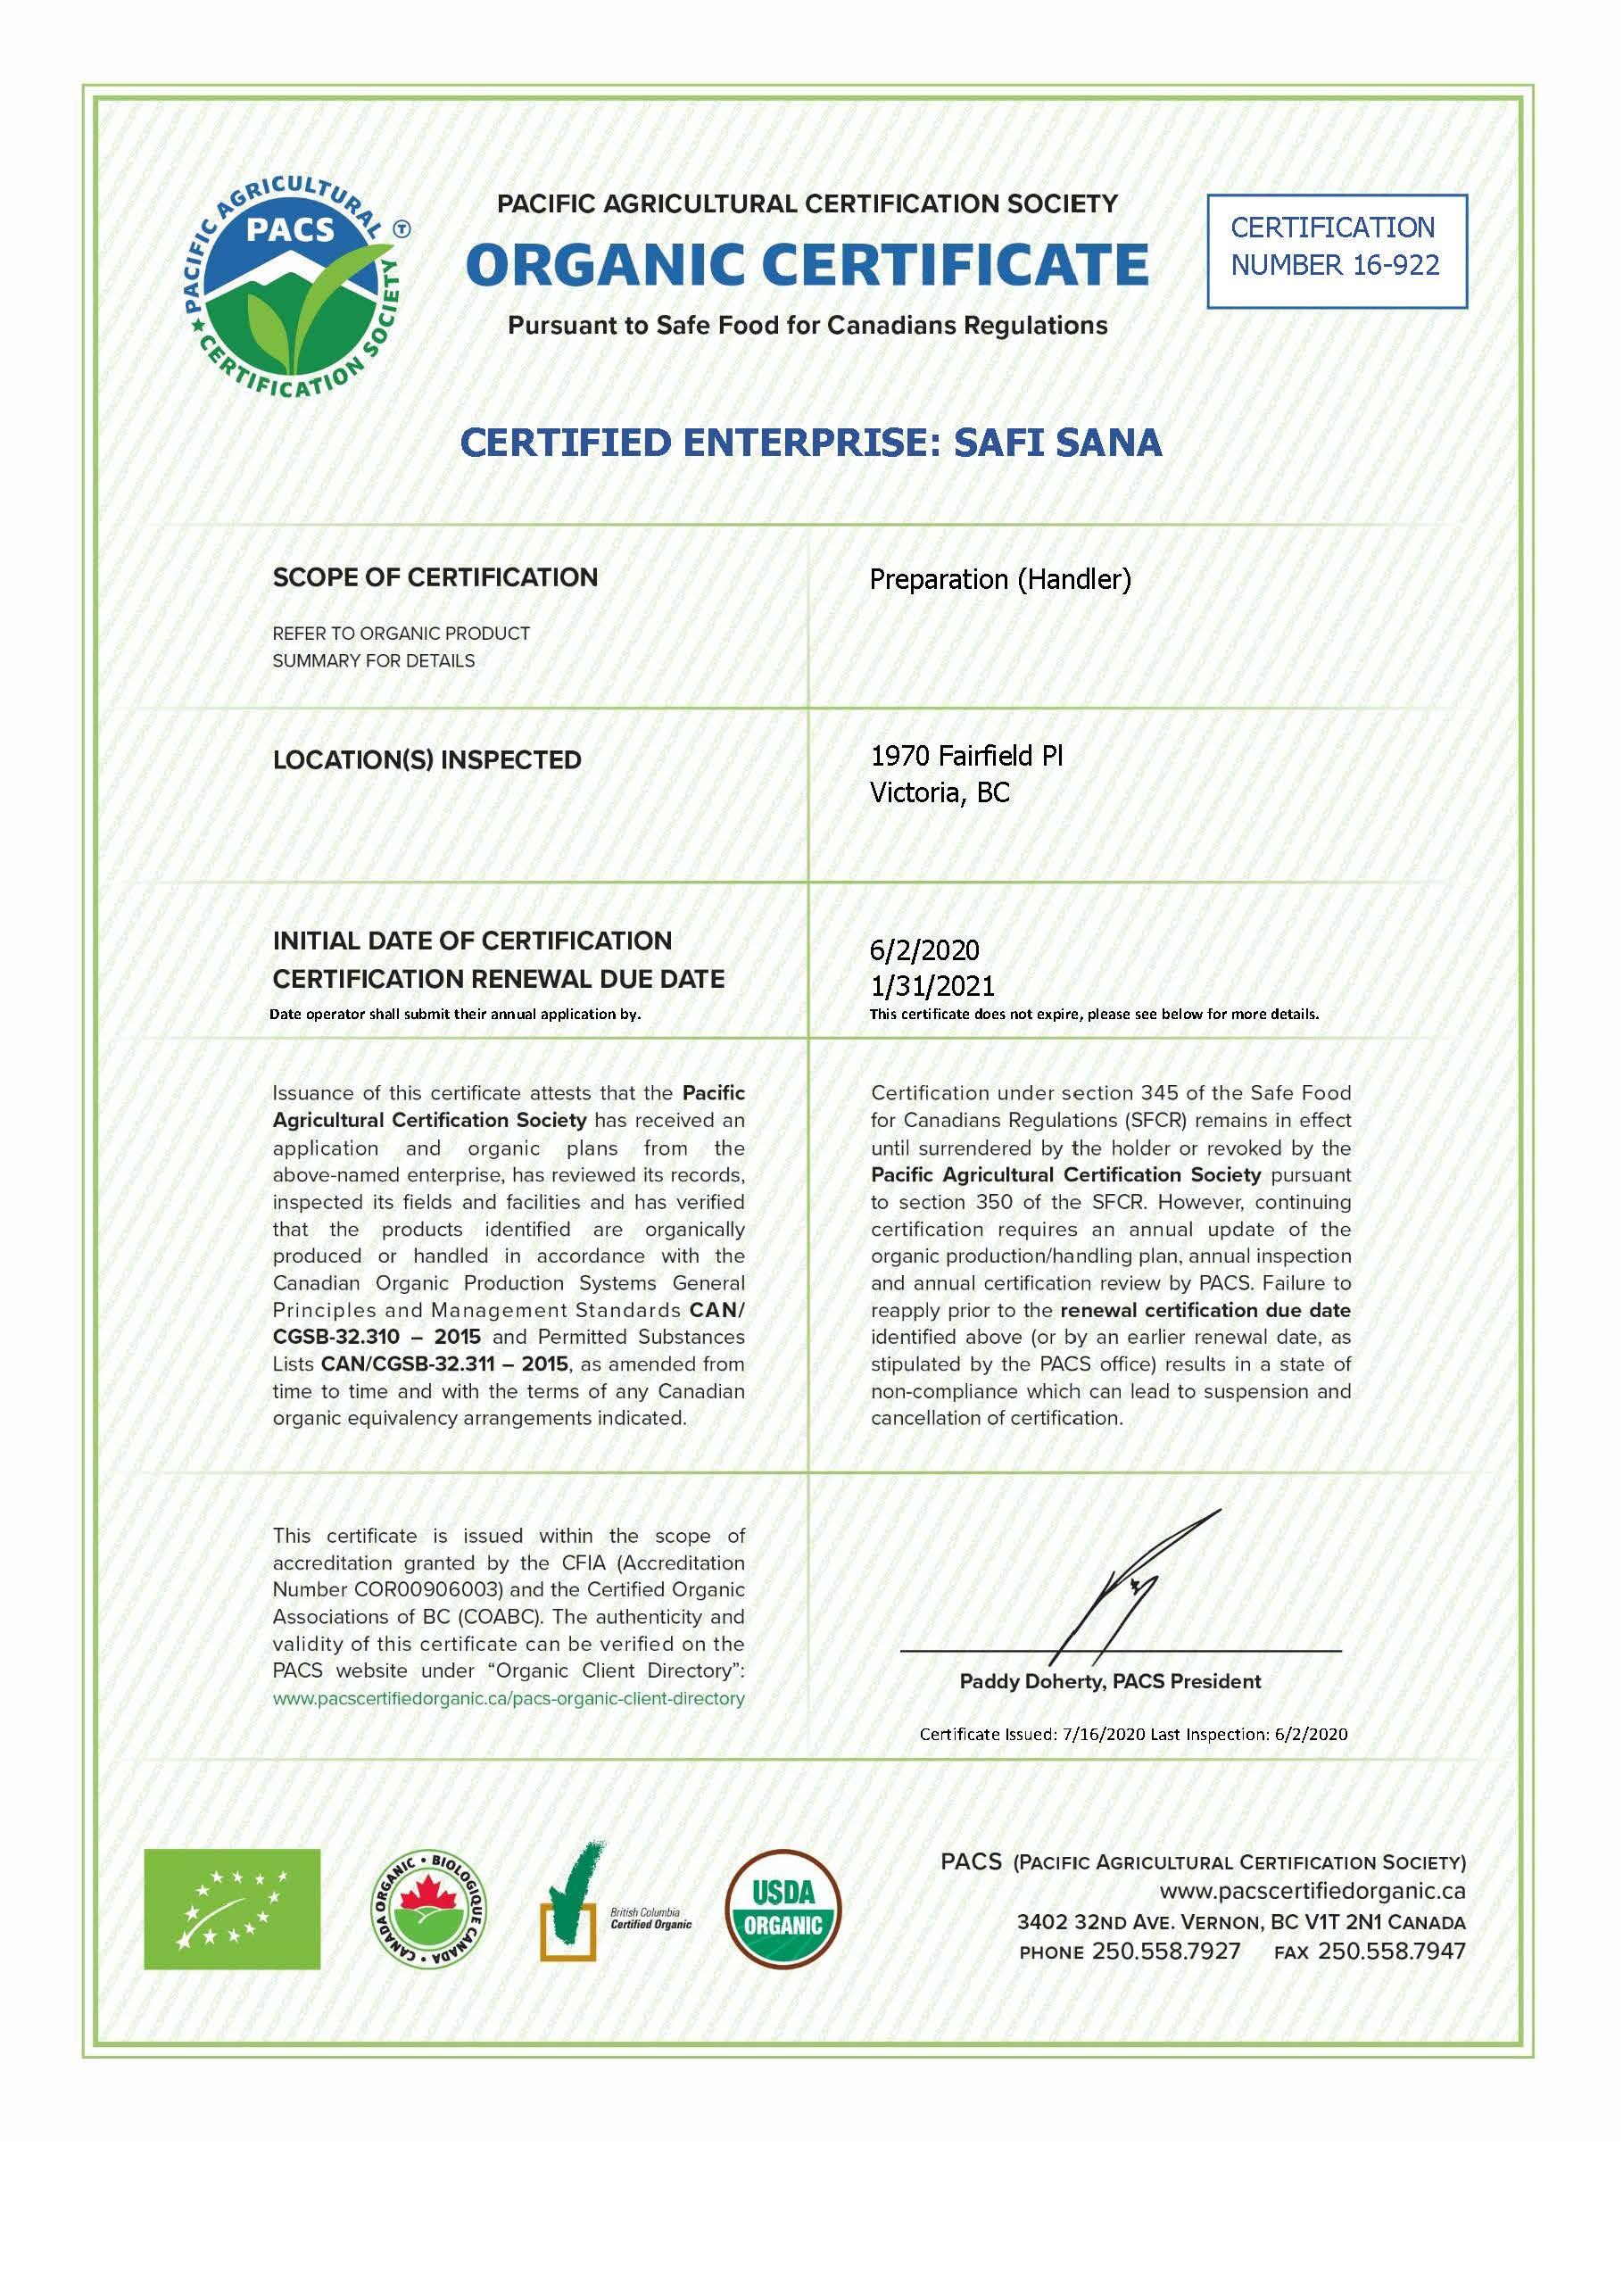 PACS organic certificate for Safi Sana